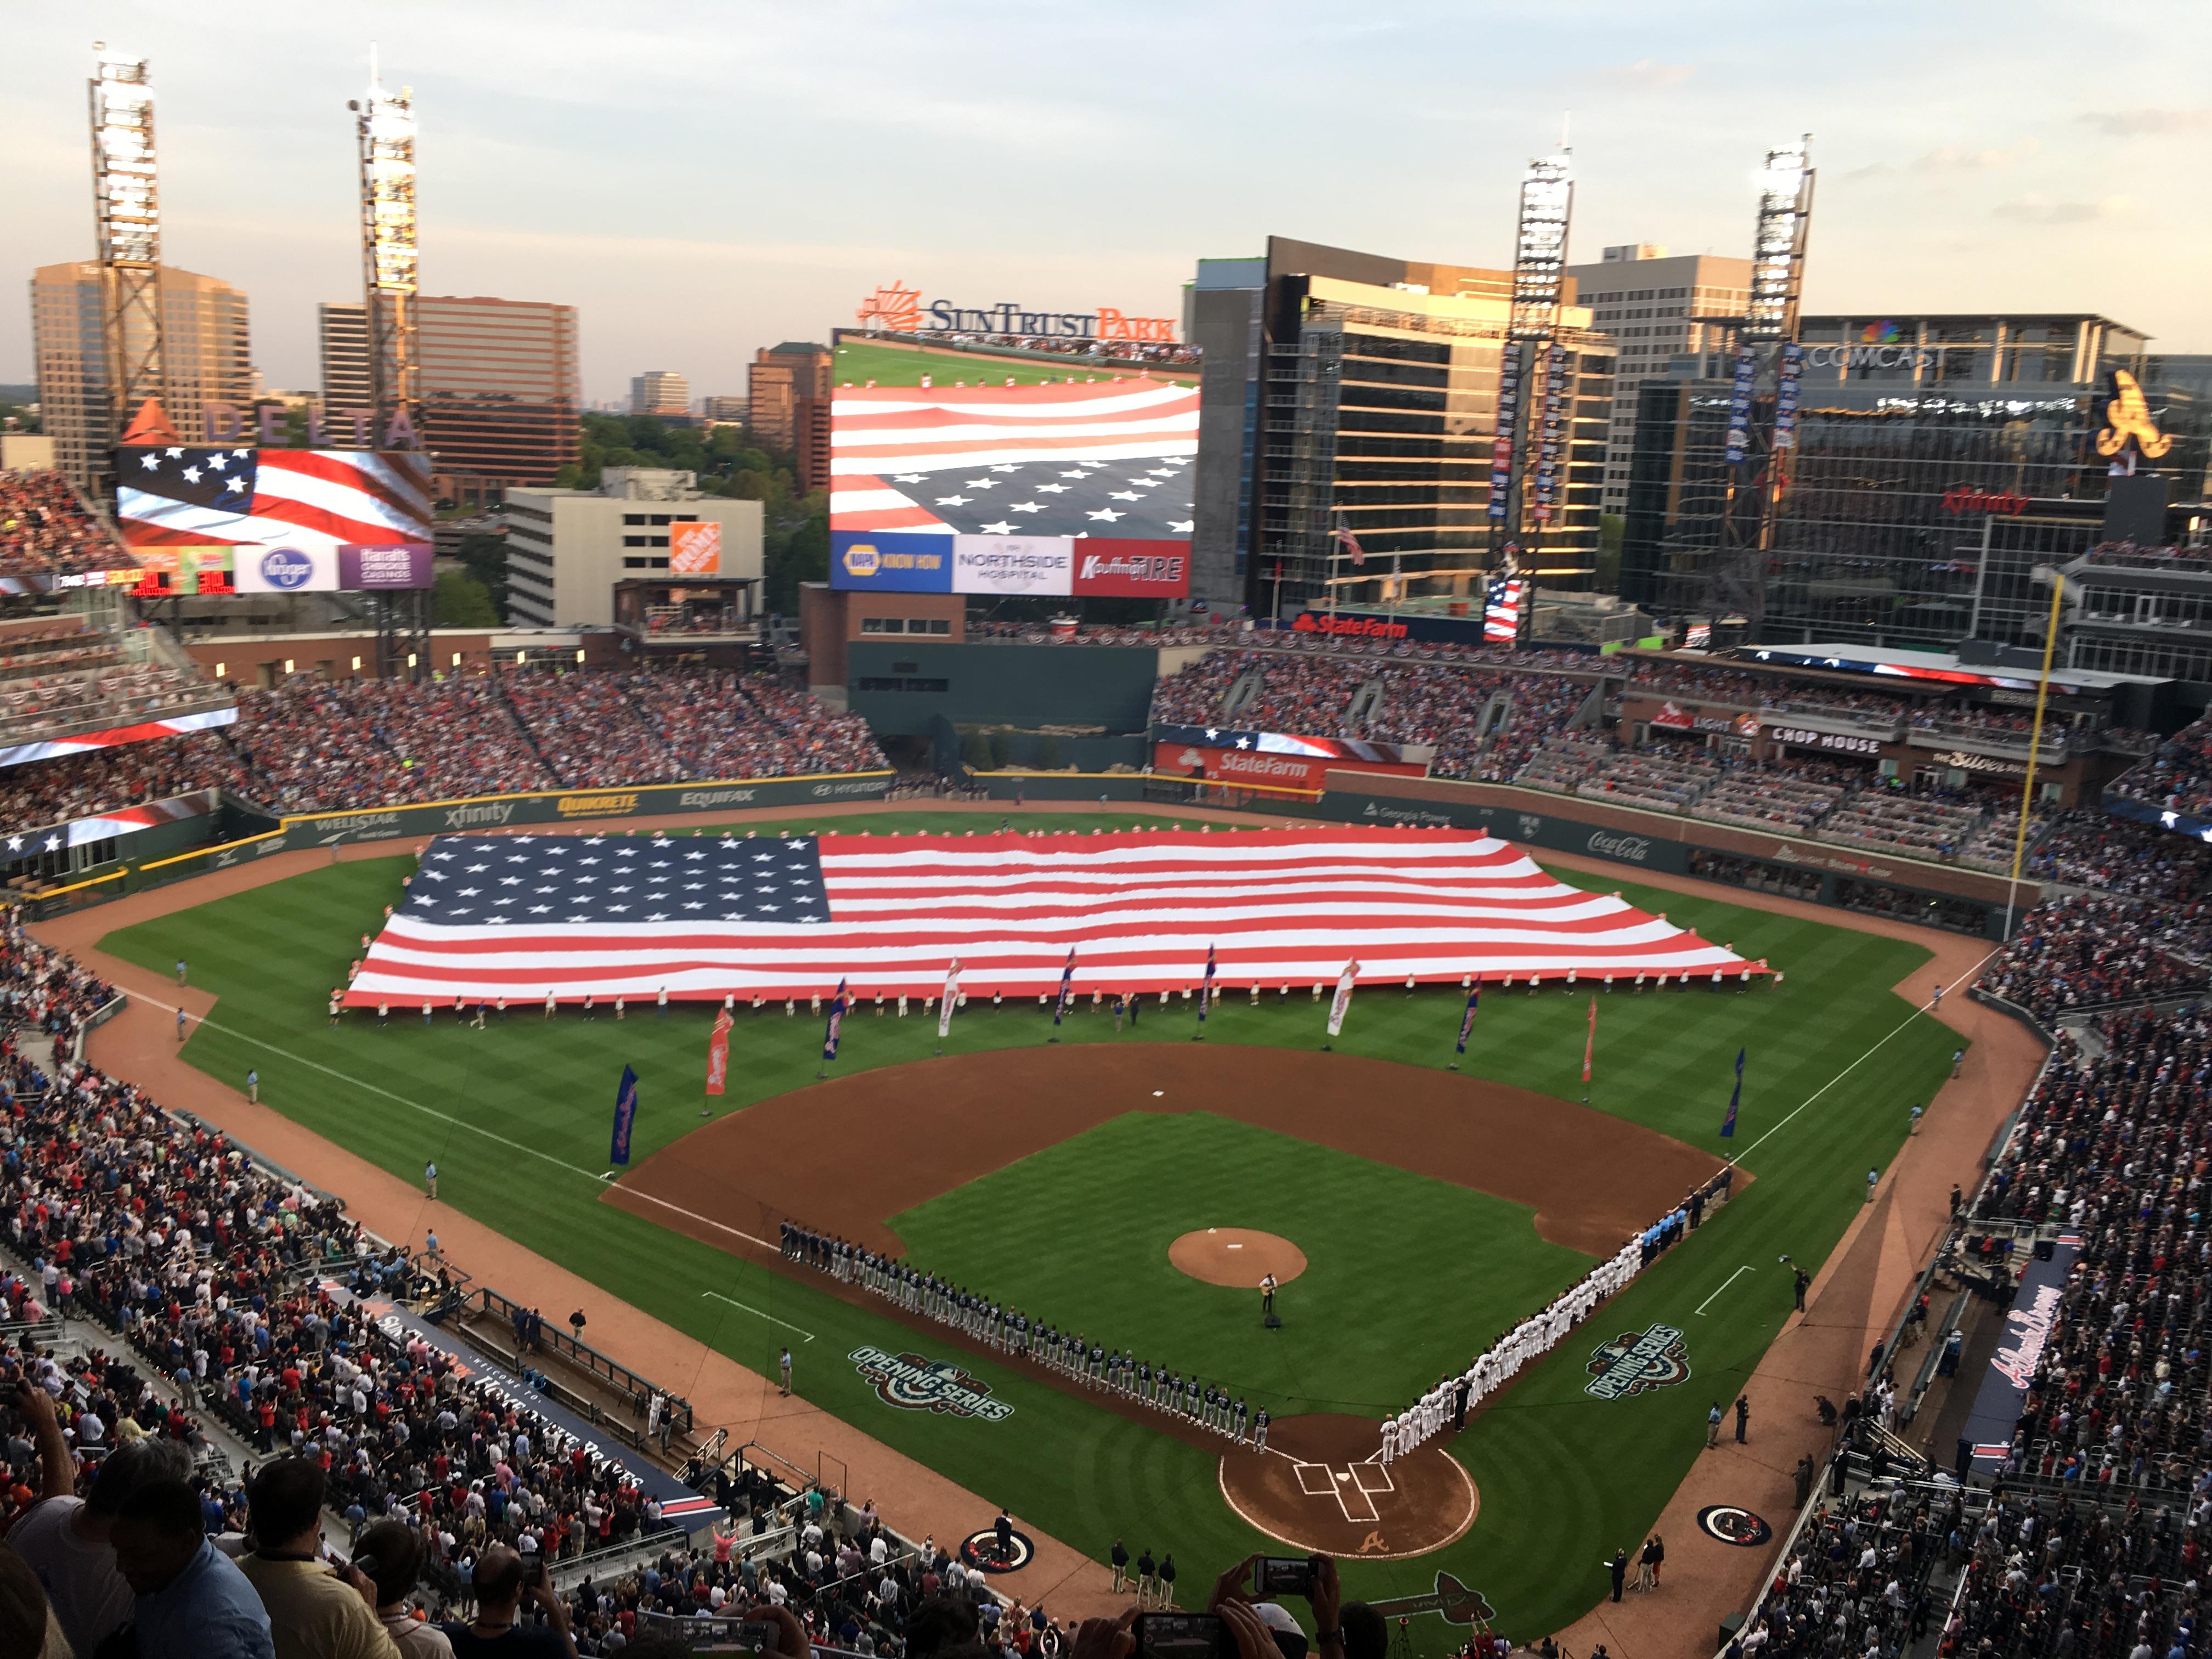 Atlanta Braves, Atlanta Falcons, Atlanta Hawks, Georgia Tech, UGA - Sports updates, blog posts news from the AJC.